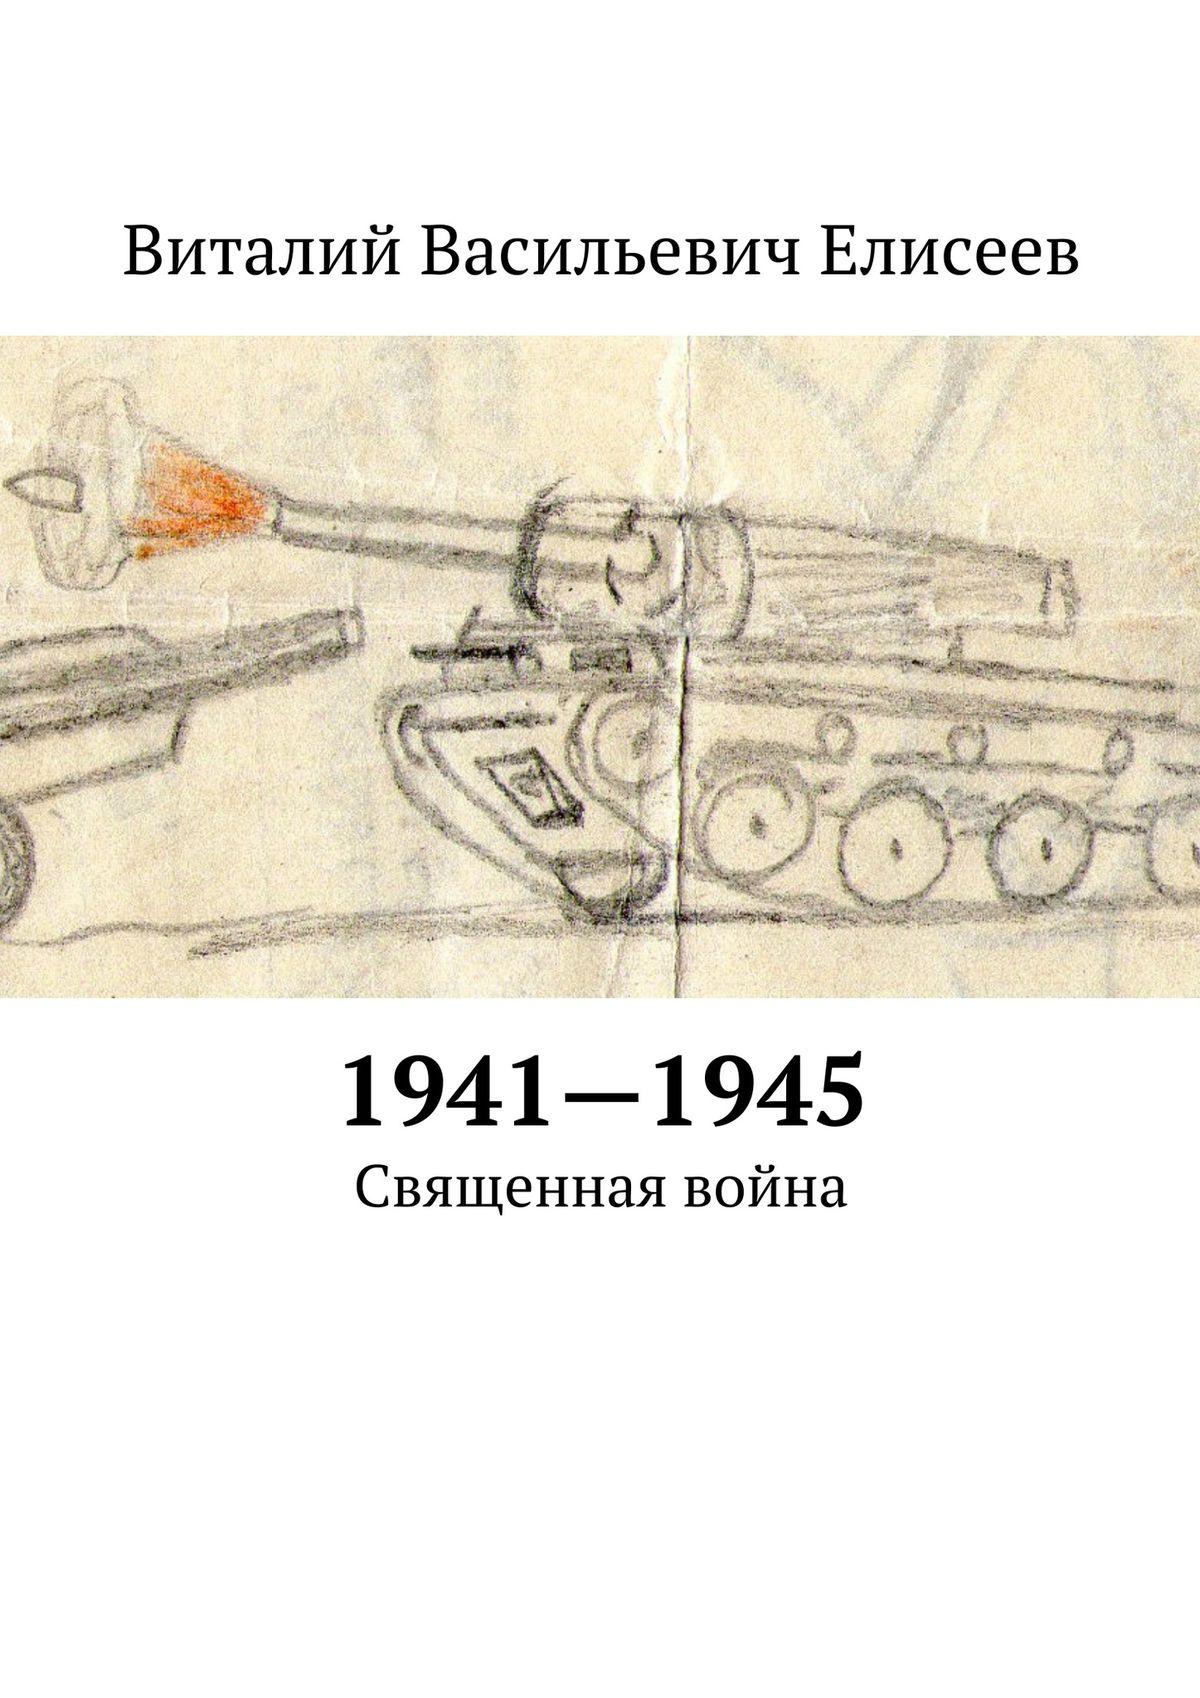 Виталий Елисеев 1941–1945. Священная война creeper bl q001 convenient outdoor self inflation dampproof dacron air cushion mat camouflage